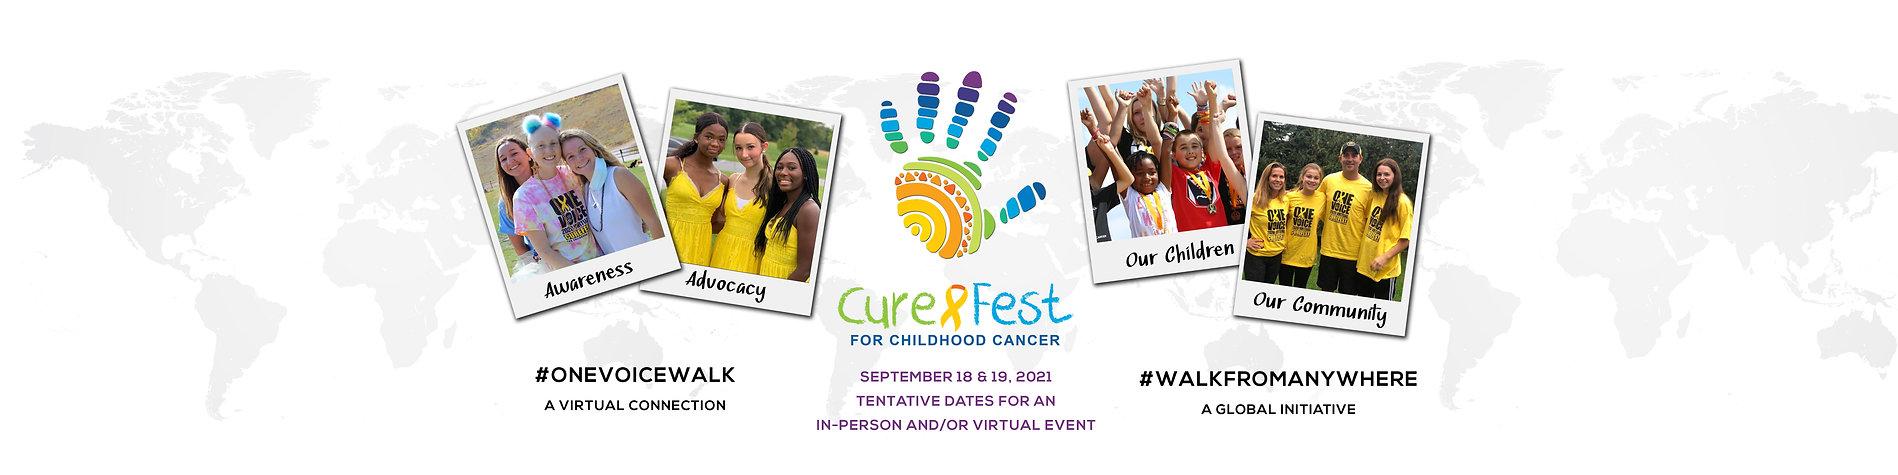 curefest banner21 wide2.jpg